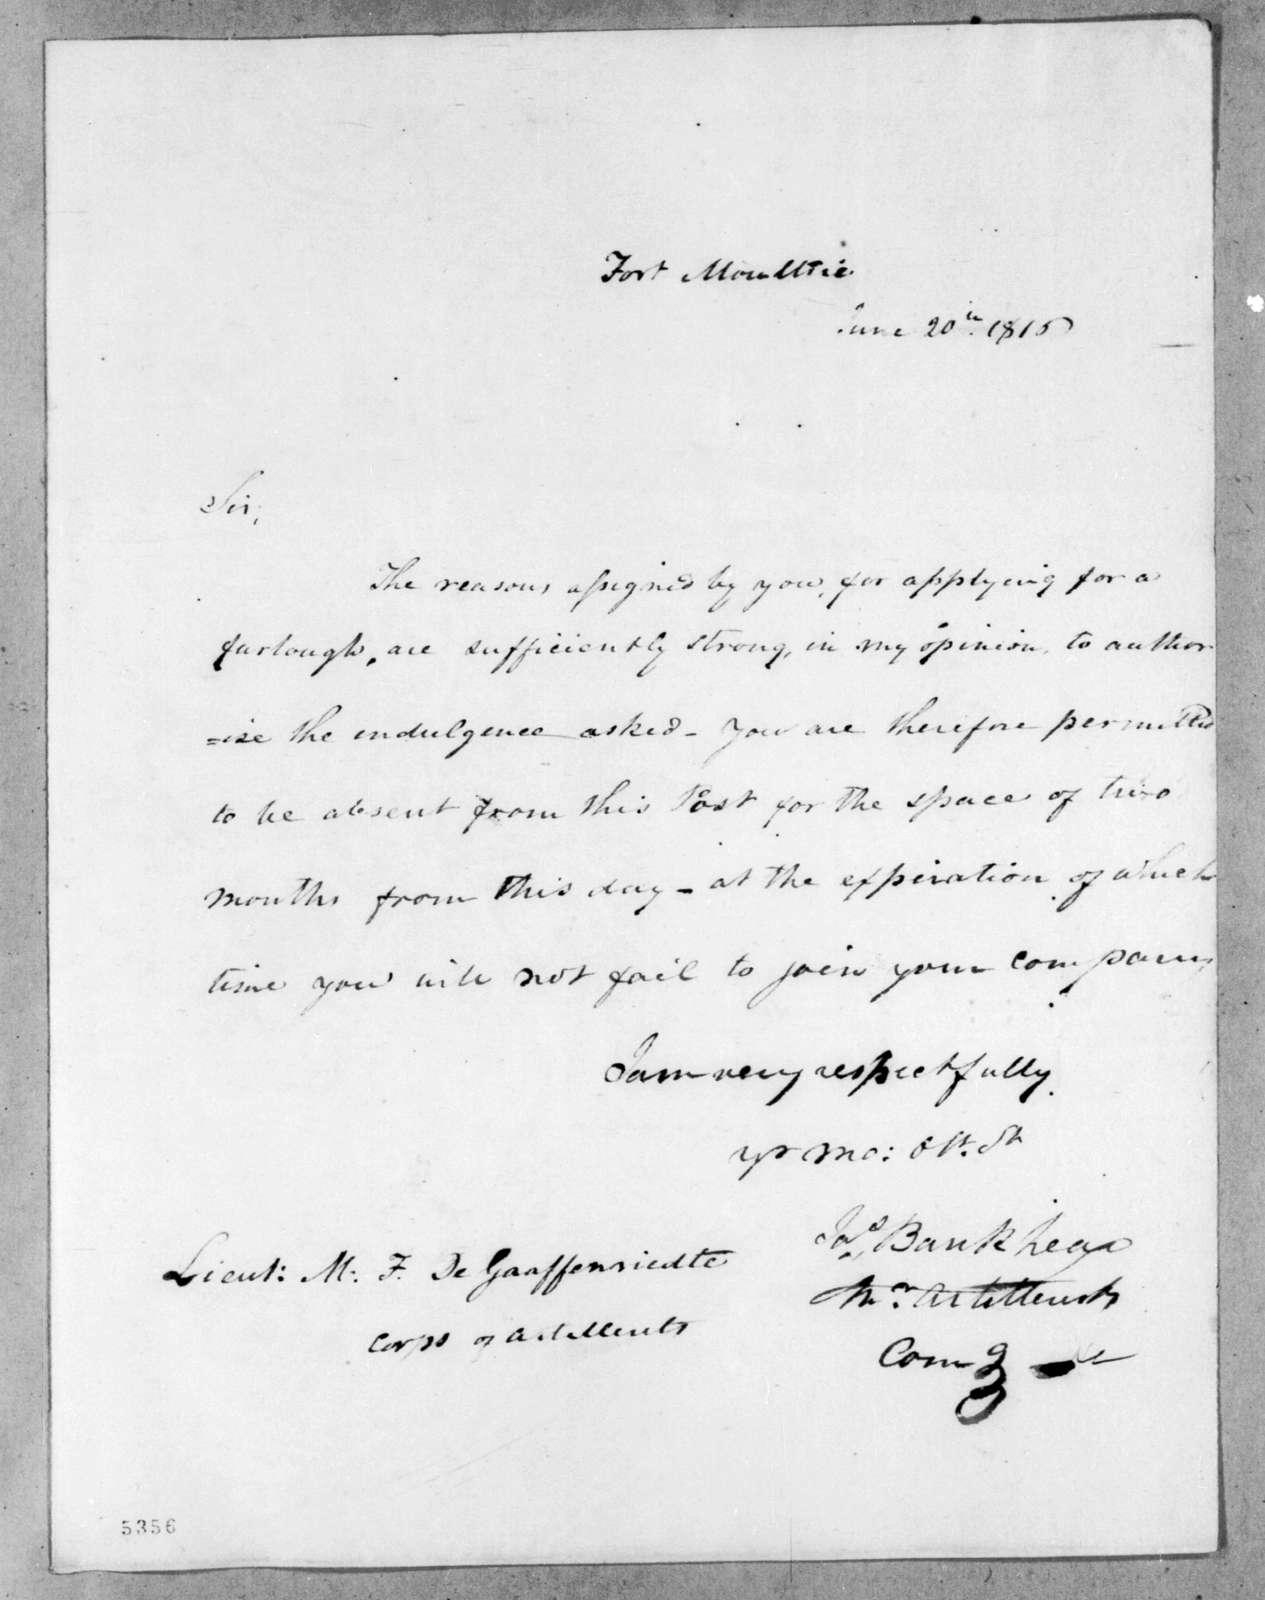 James Bankhead to Mathew F. Degraffenried, June 20, 1816